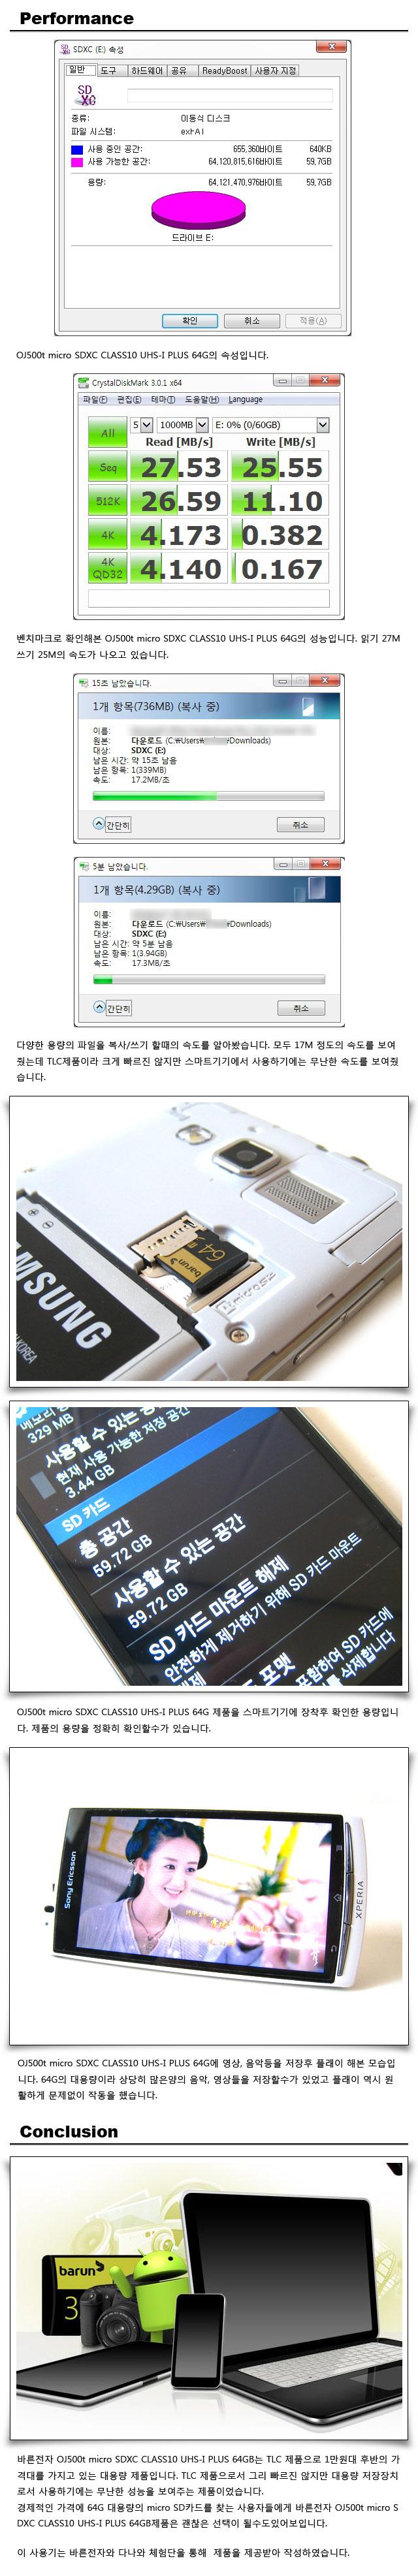 OJ500t_04.jpg